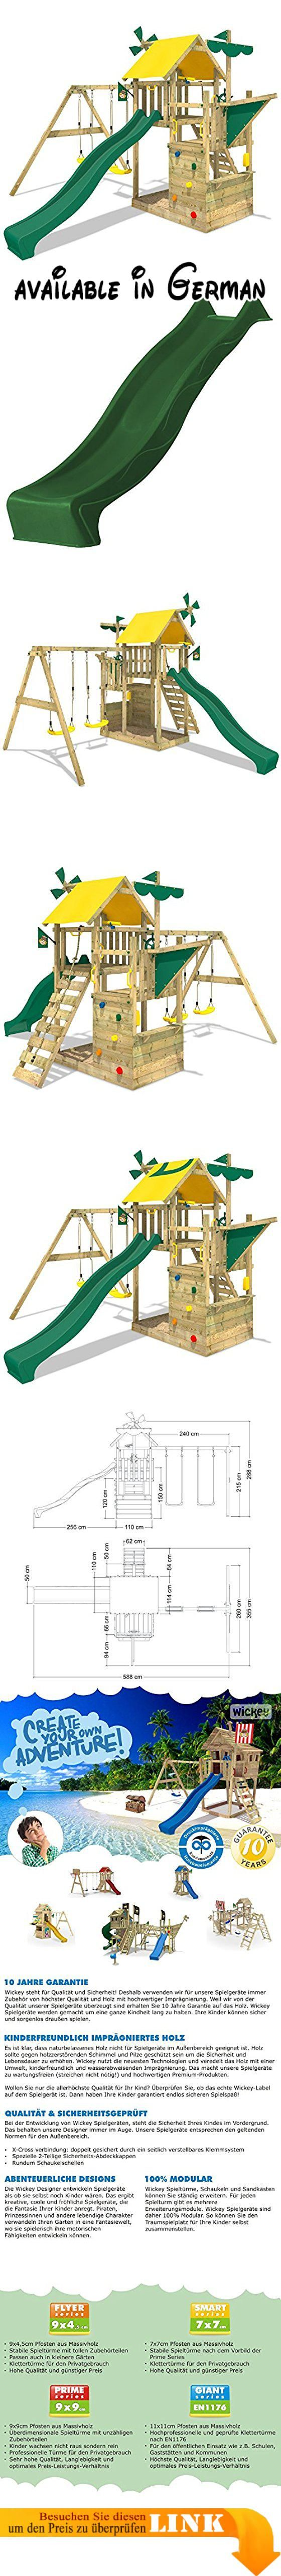 WICKEY Kletterturm Smart Sail Spielturm Klettergerüst mit ...